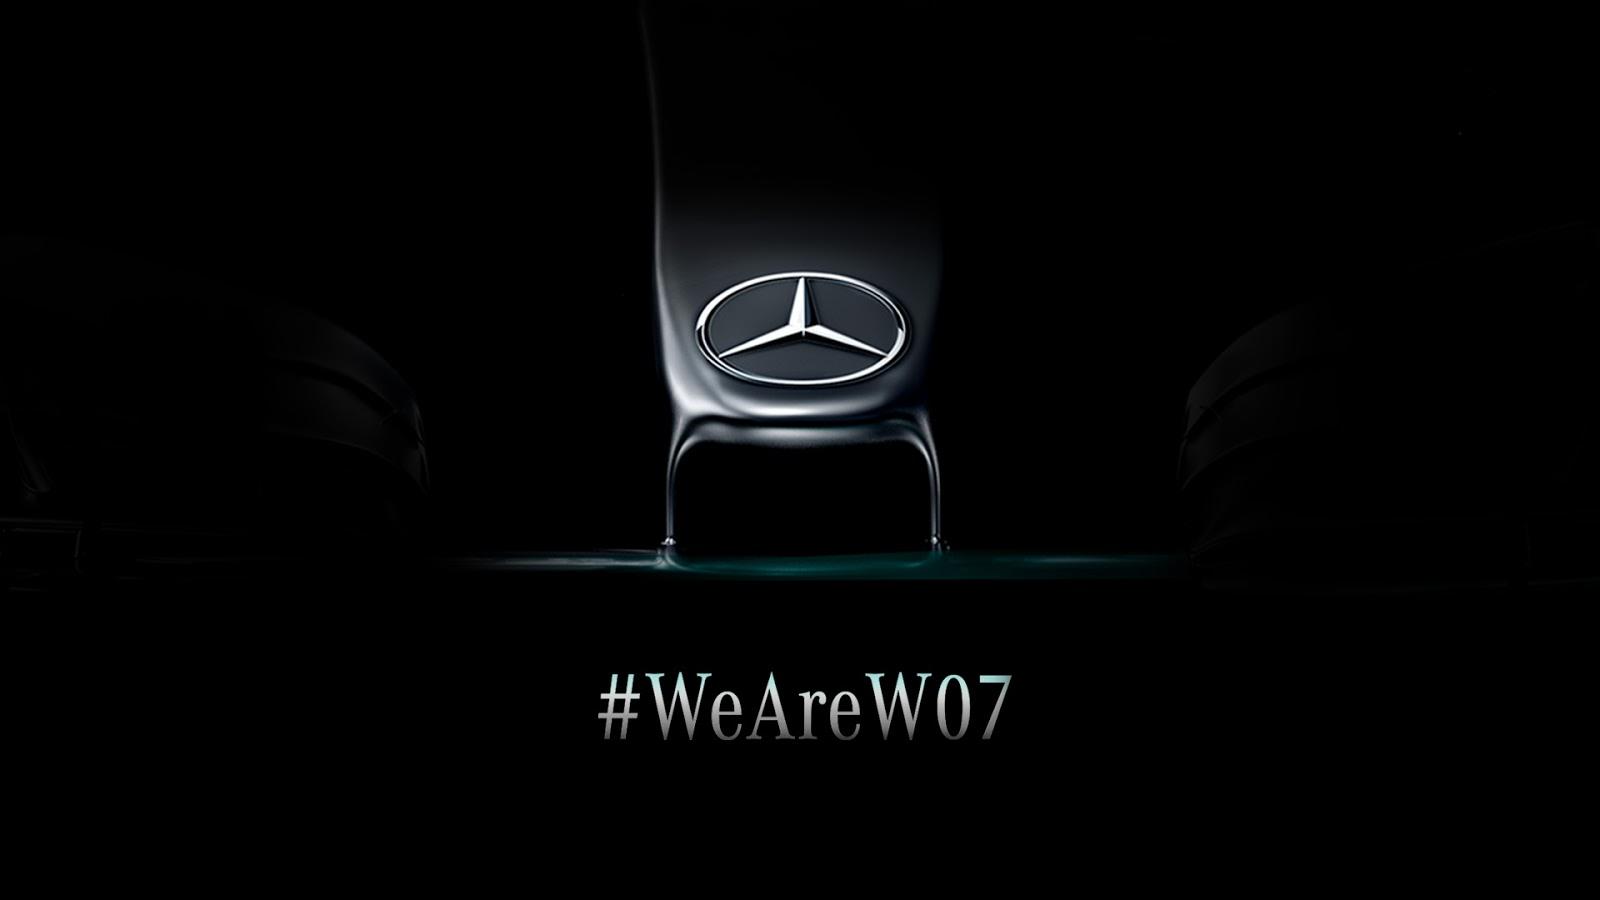 2018 MercedesAMG F1 W09 EQ Power  Car Pixel